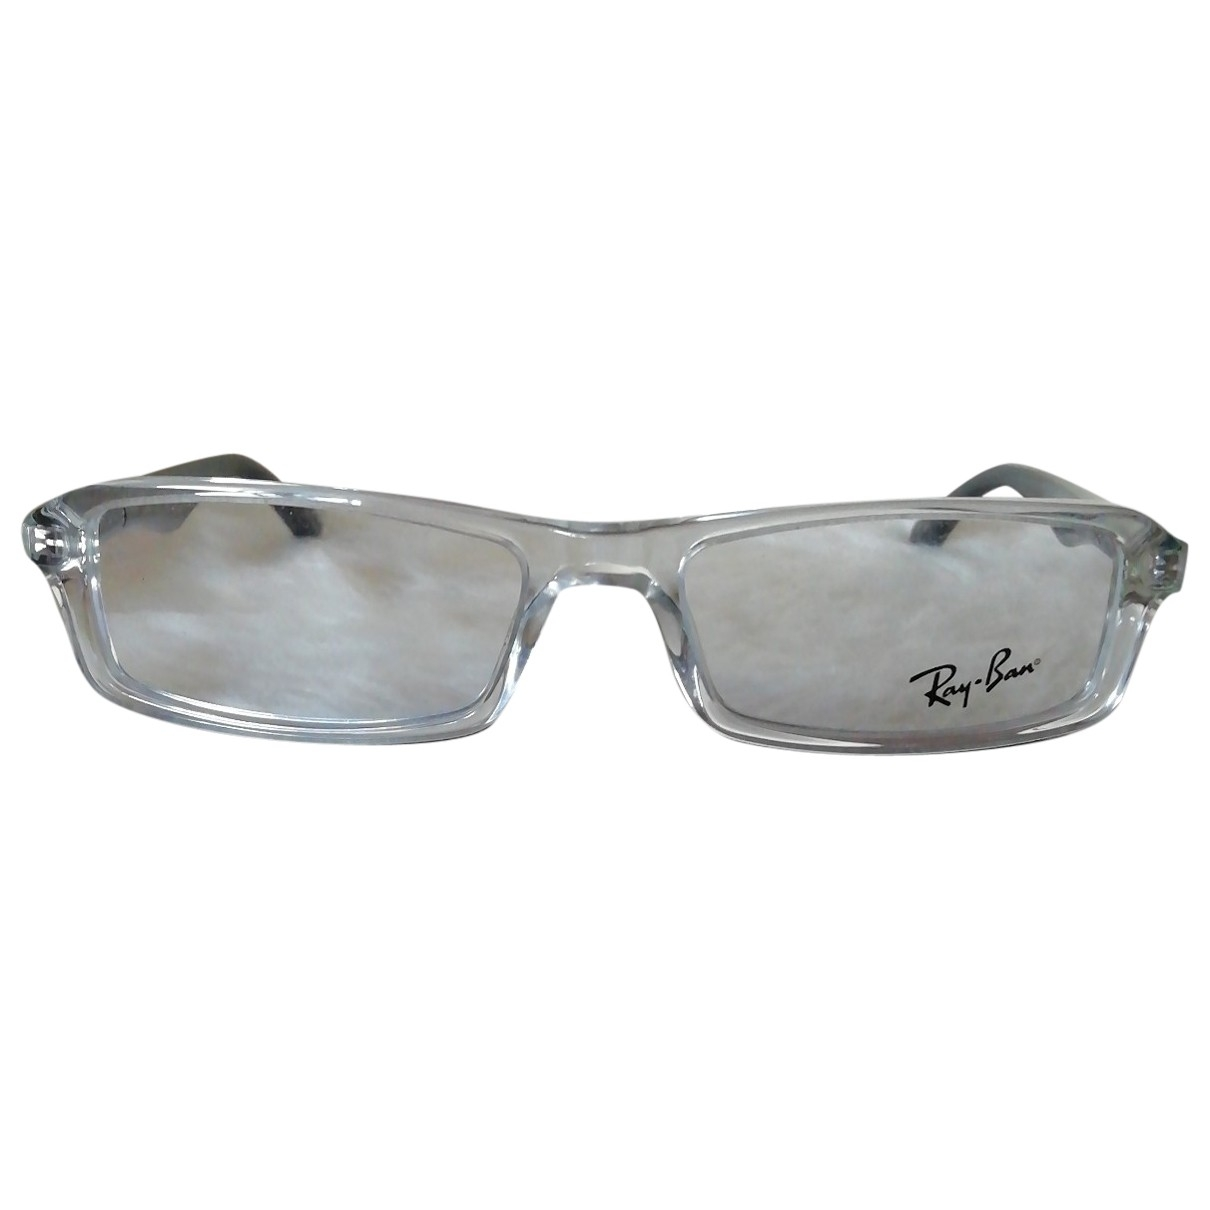 Ray-ban \N Sonnenbrillen in Kunststoff